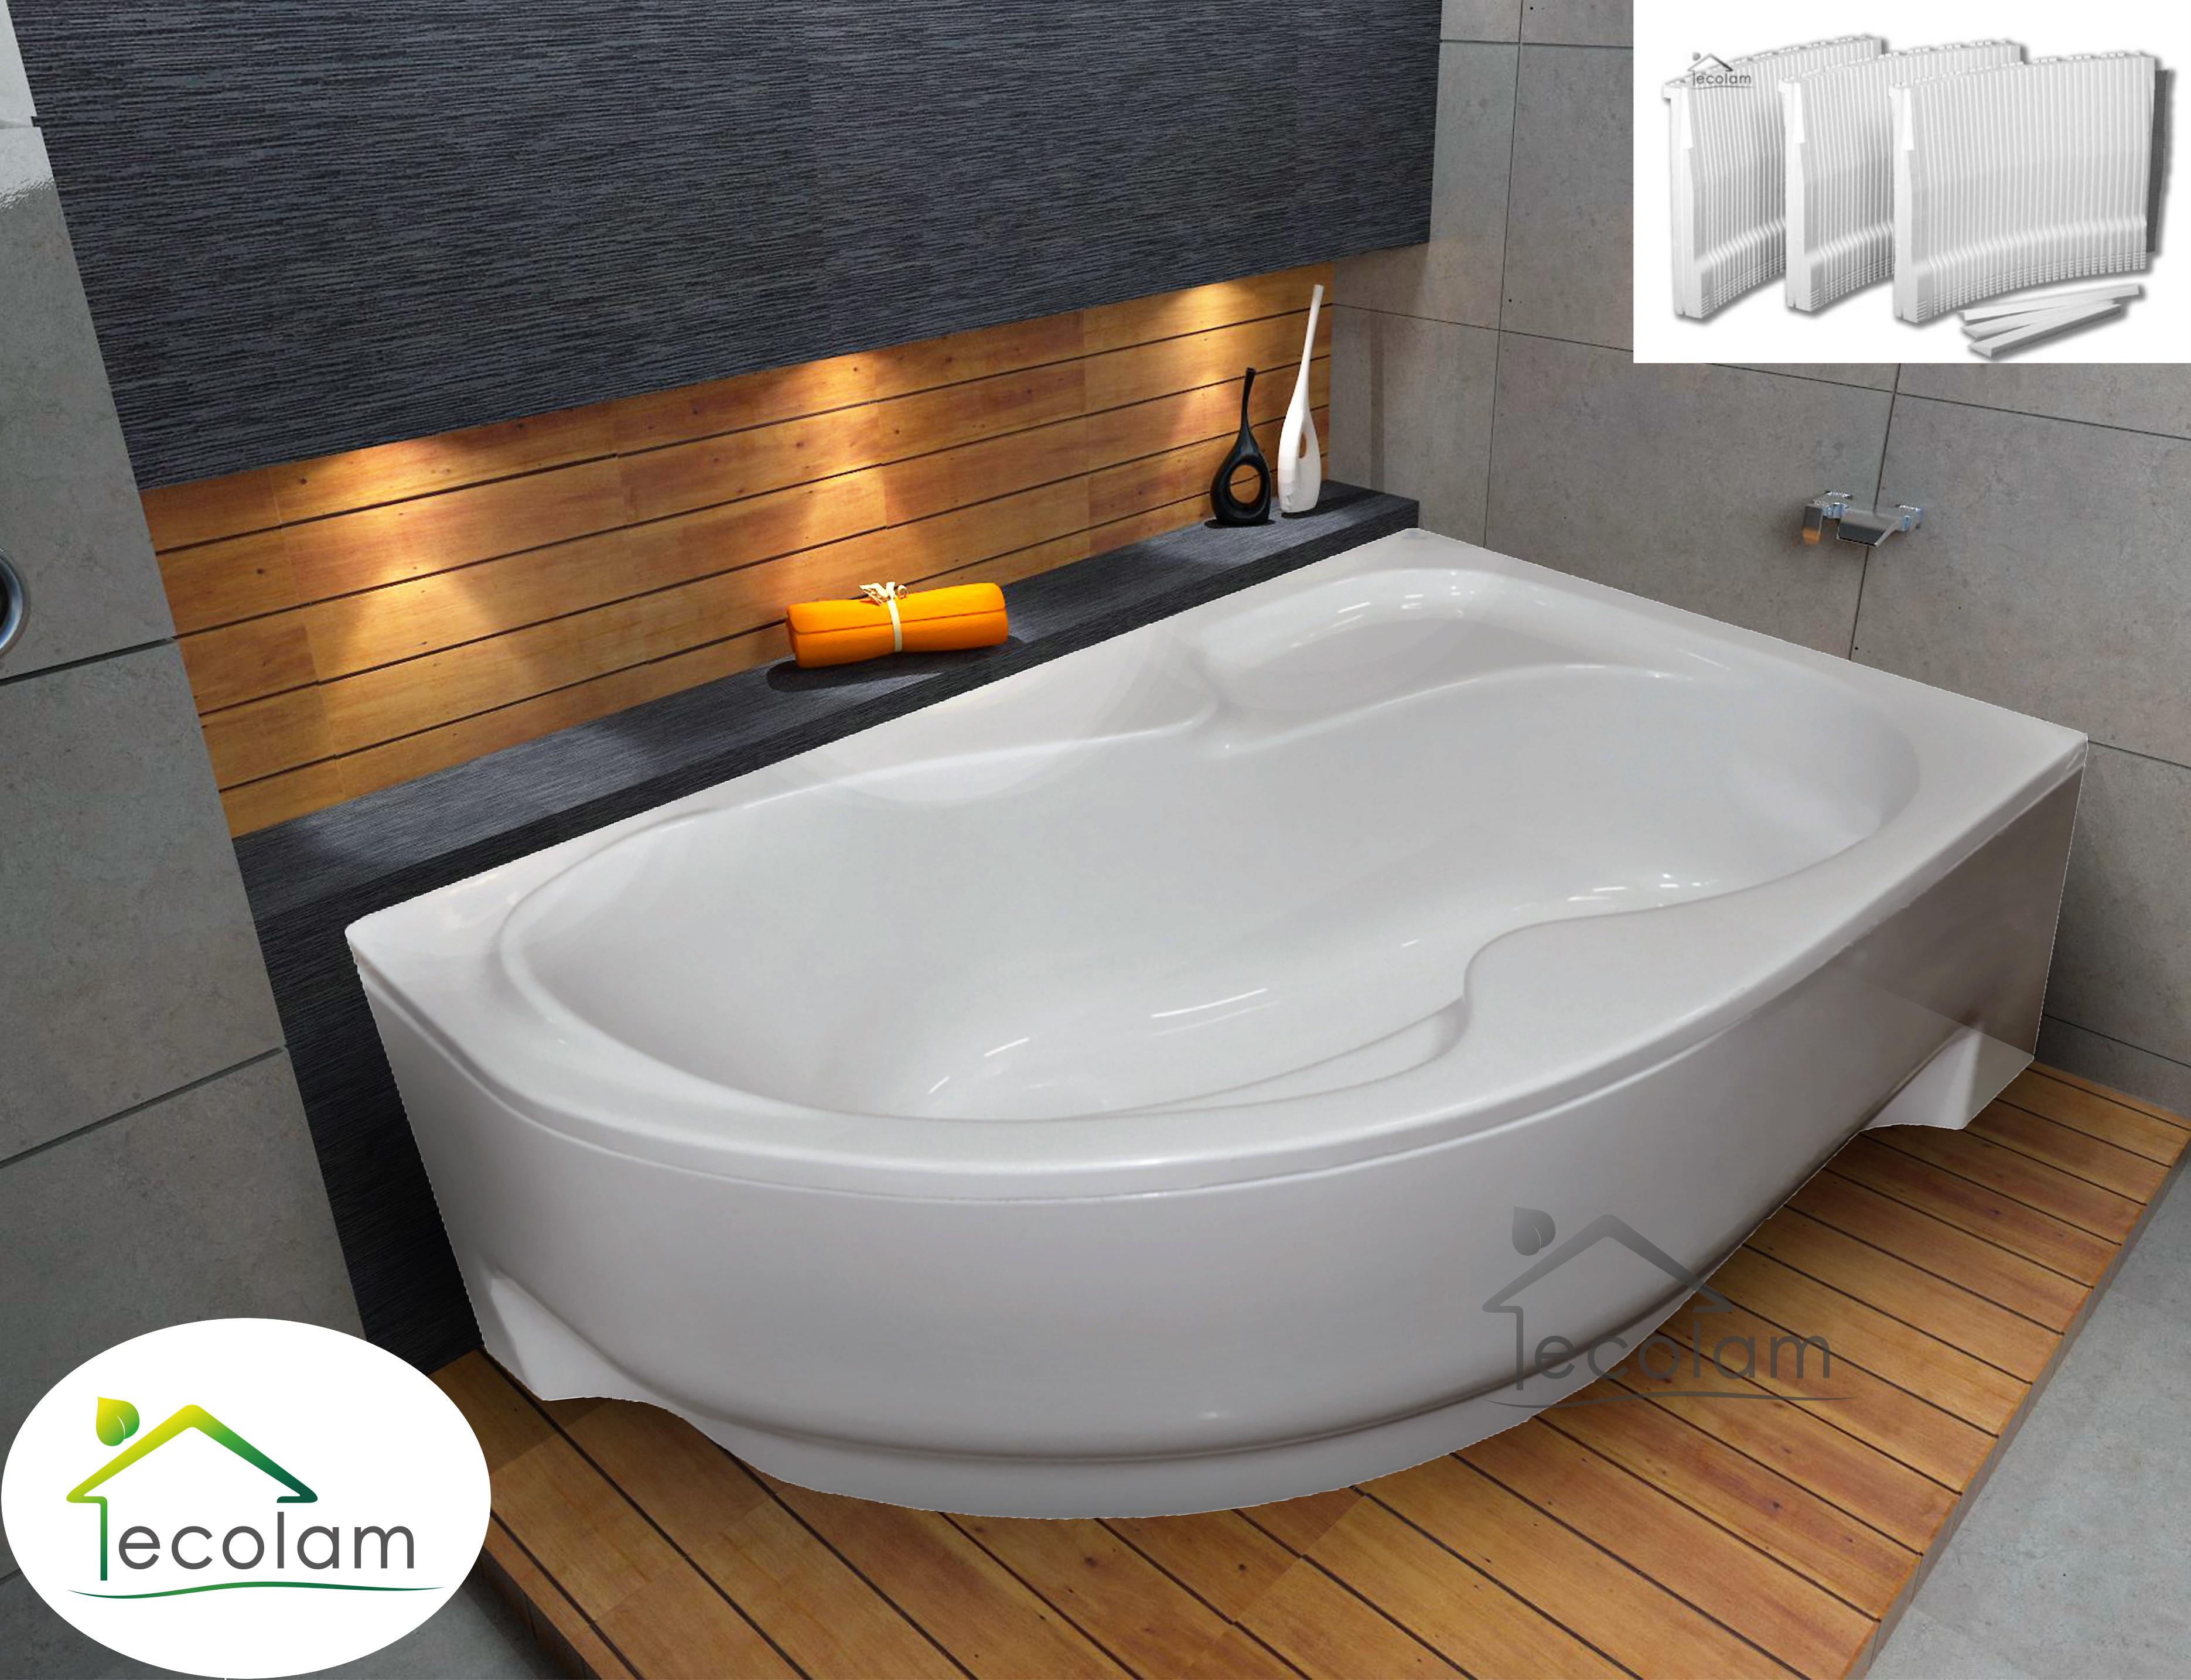 badewanne wanne eckwanne acryl 150 160 170 x 100 cm. Black Bedroom Furniture Sets. Home Design Ideas